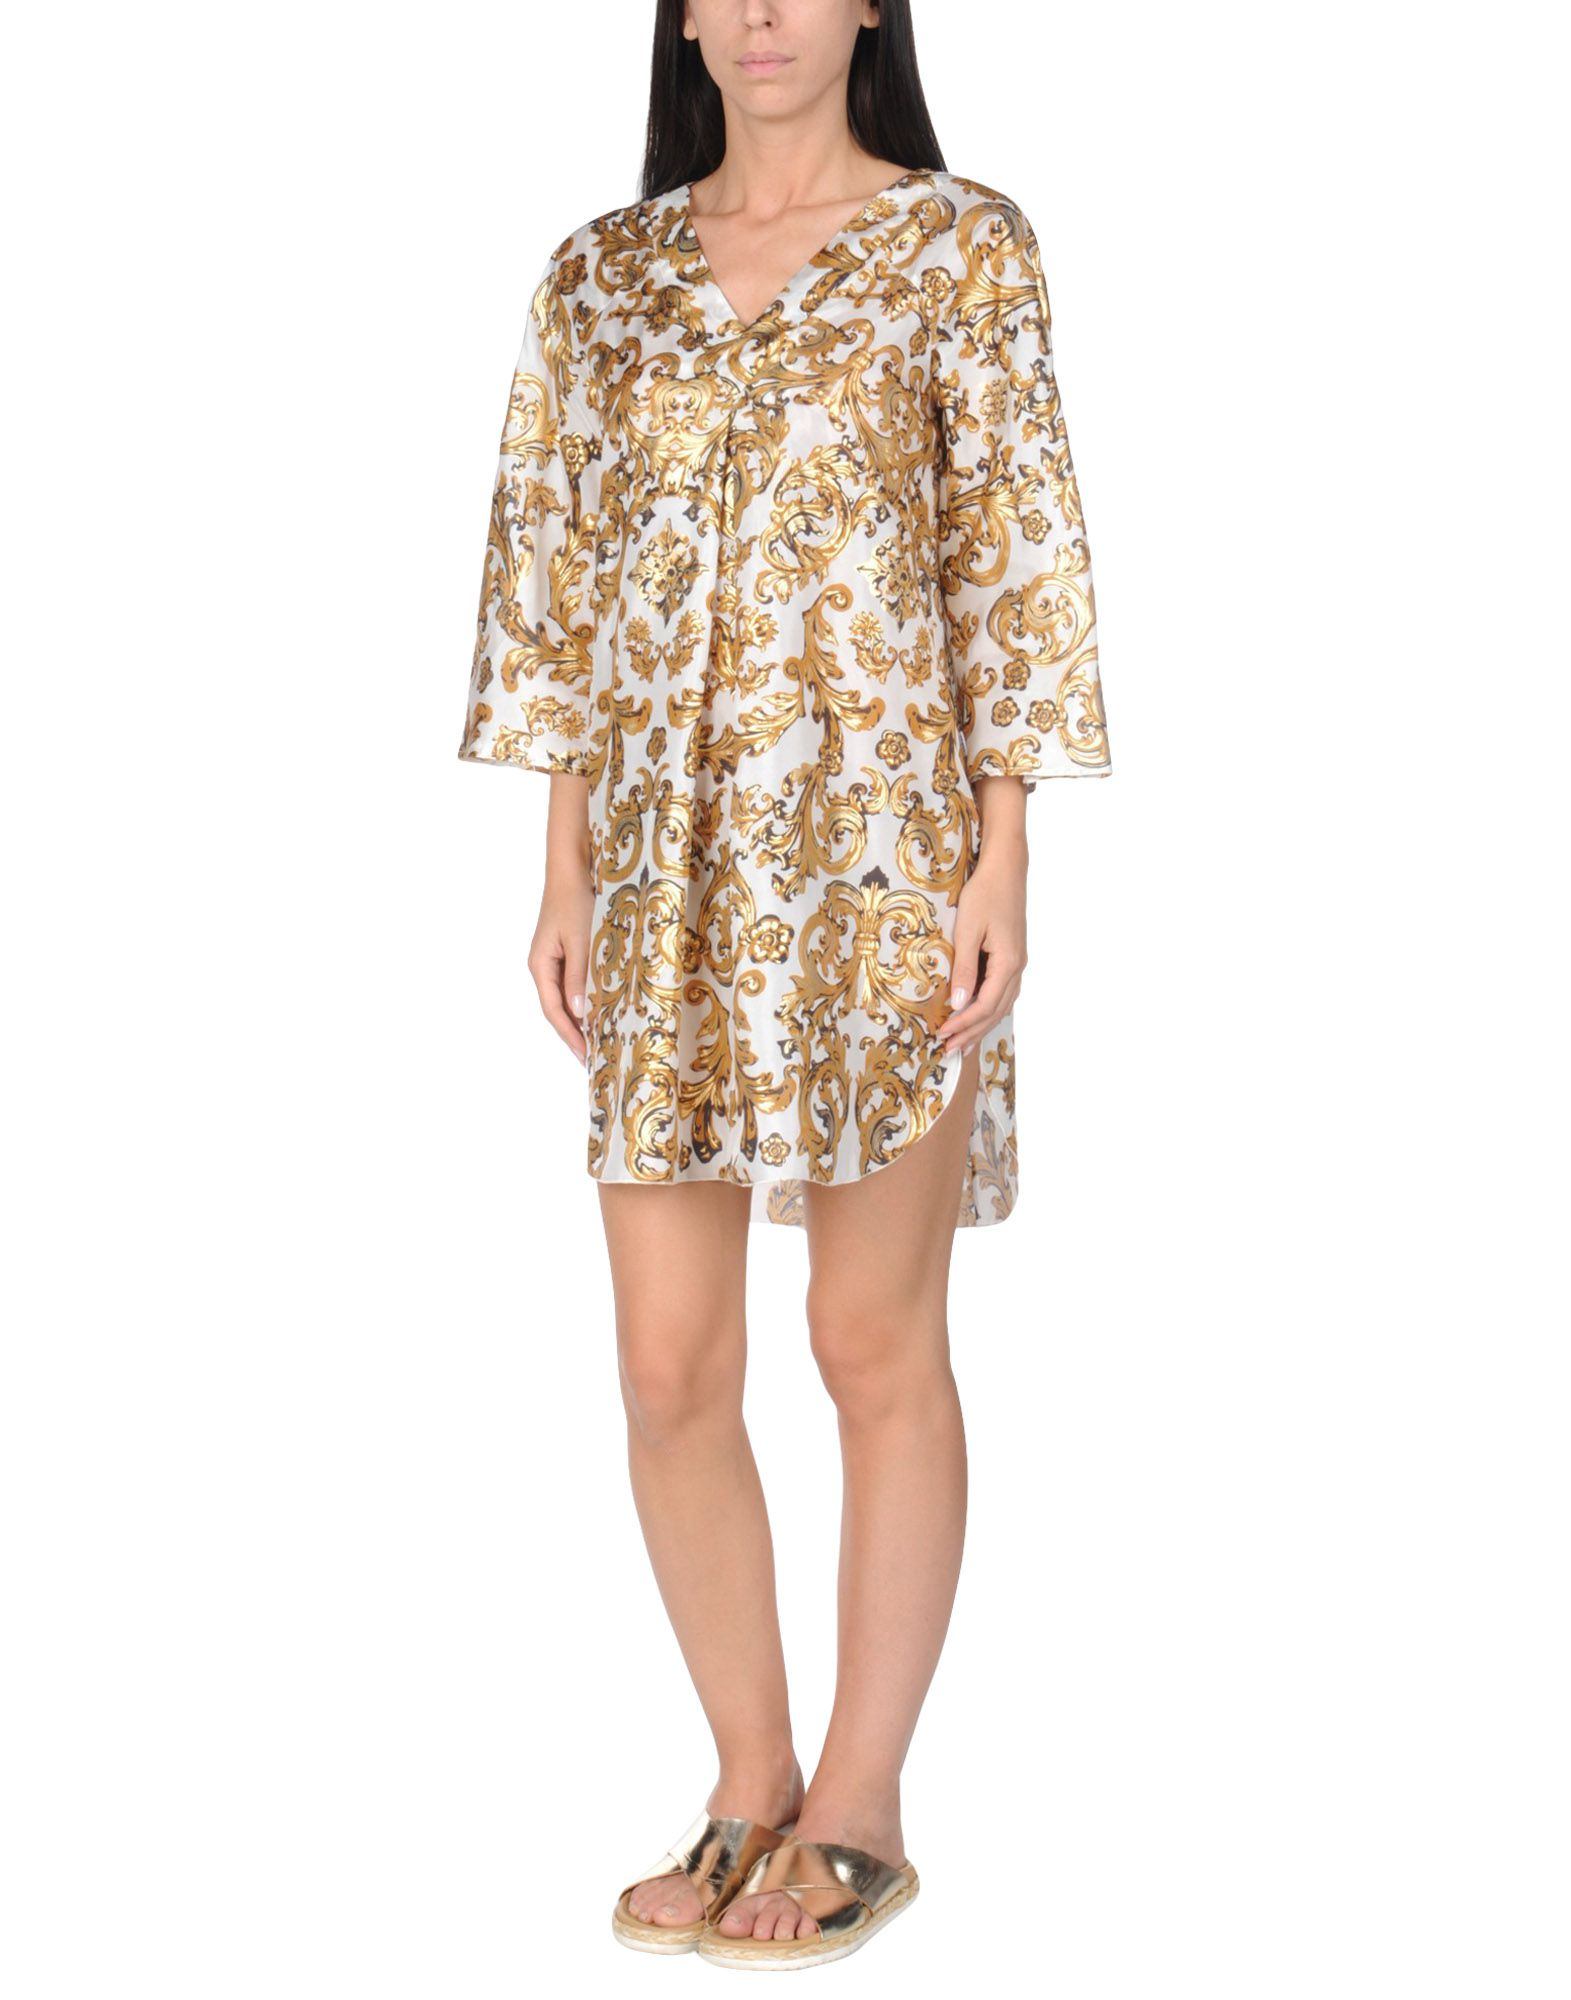 Copricostume Blugirl Blumarine Beachwear Donna - Acquista online su 6xzI6